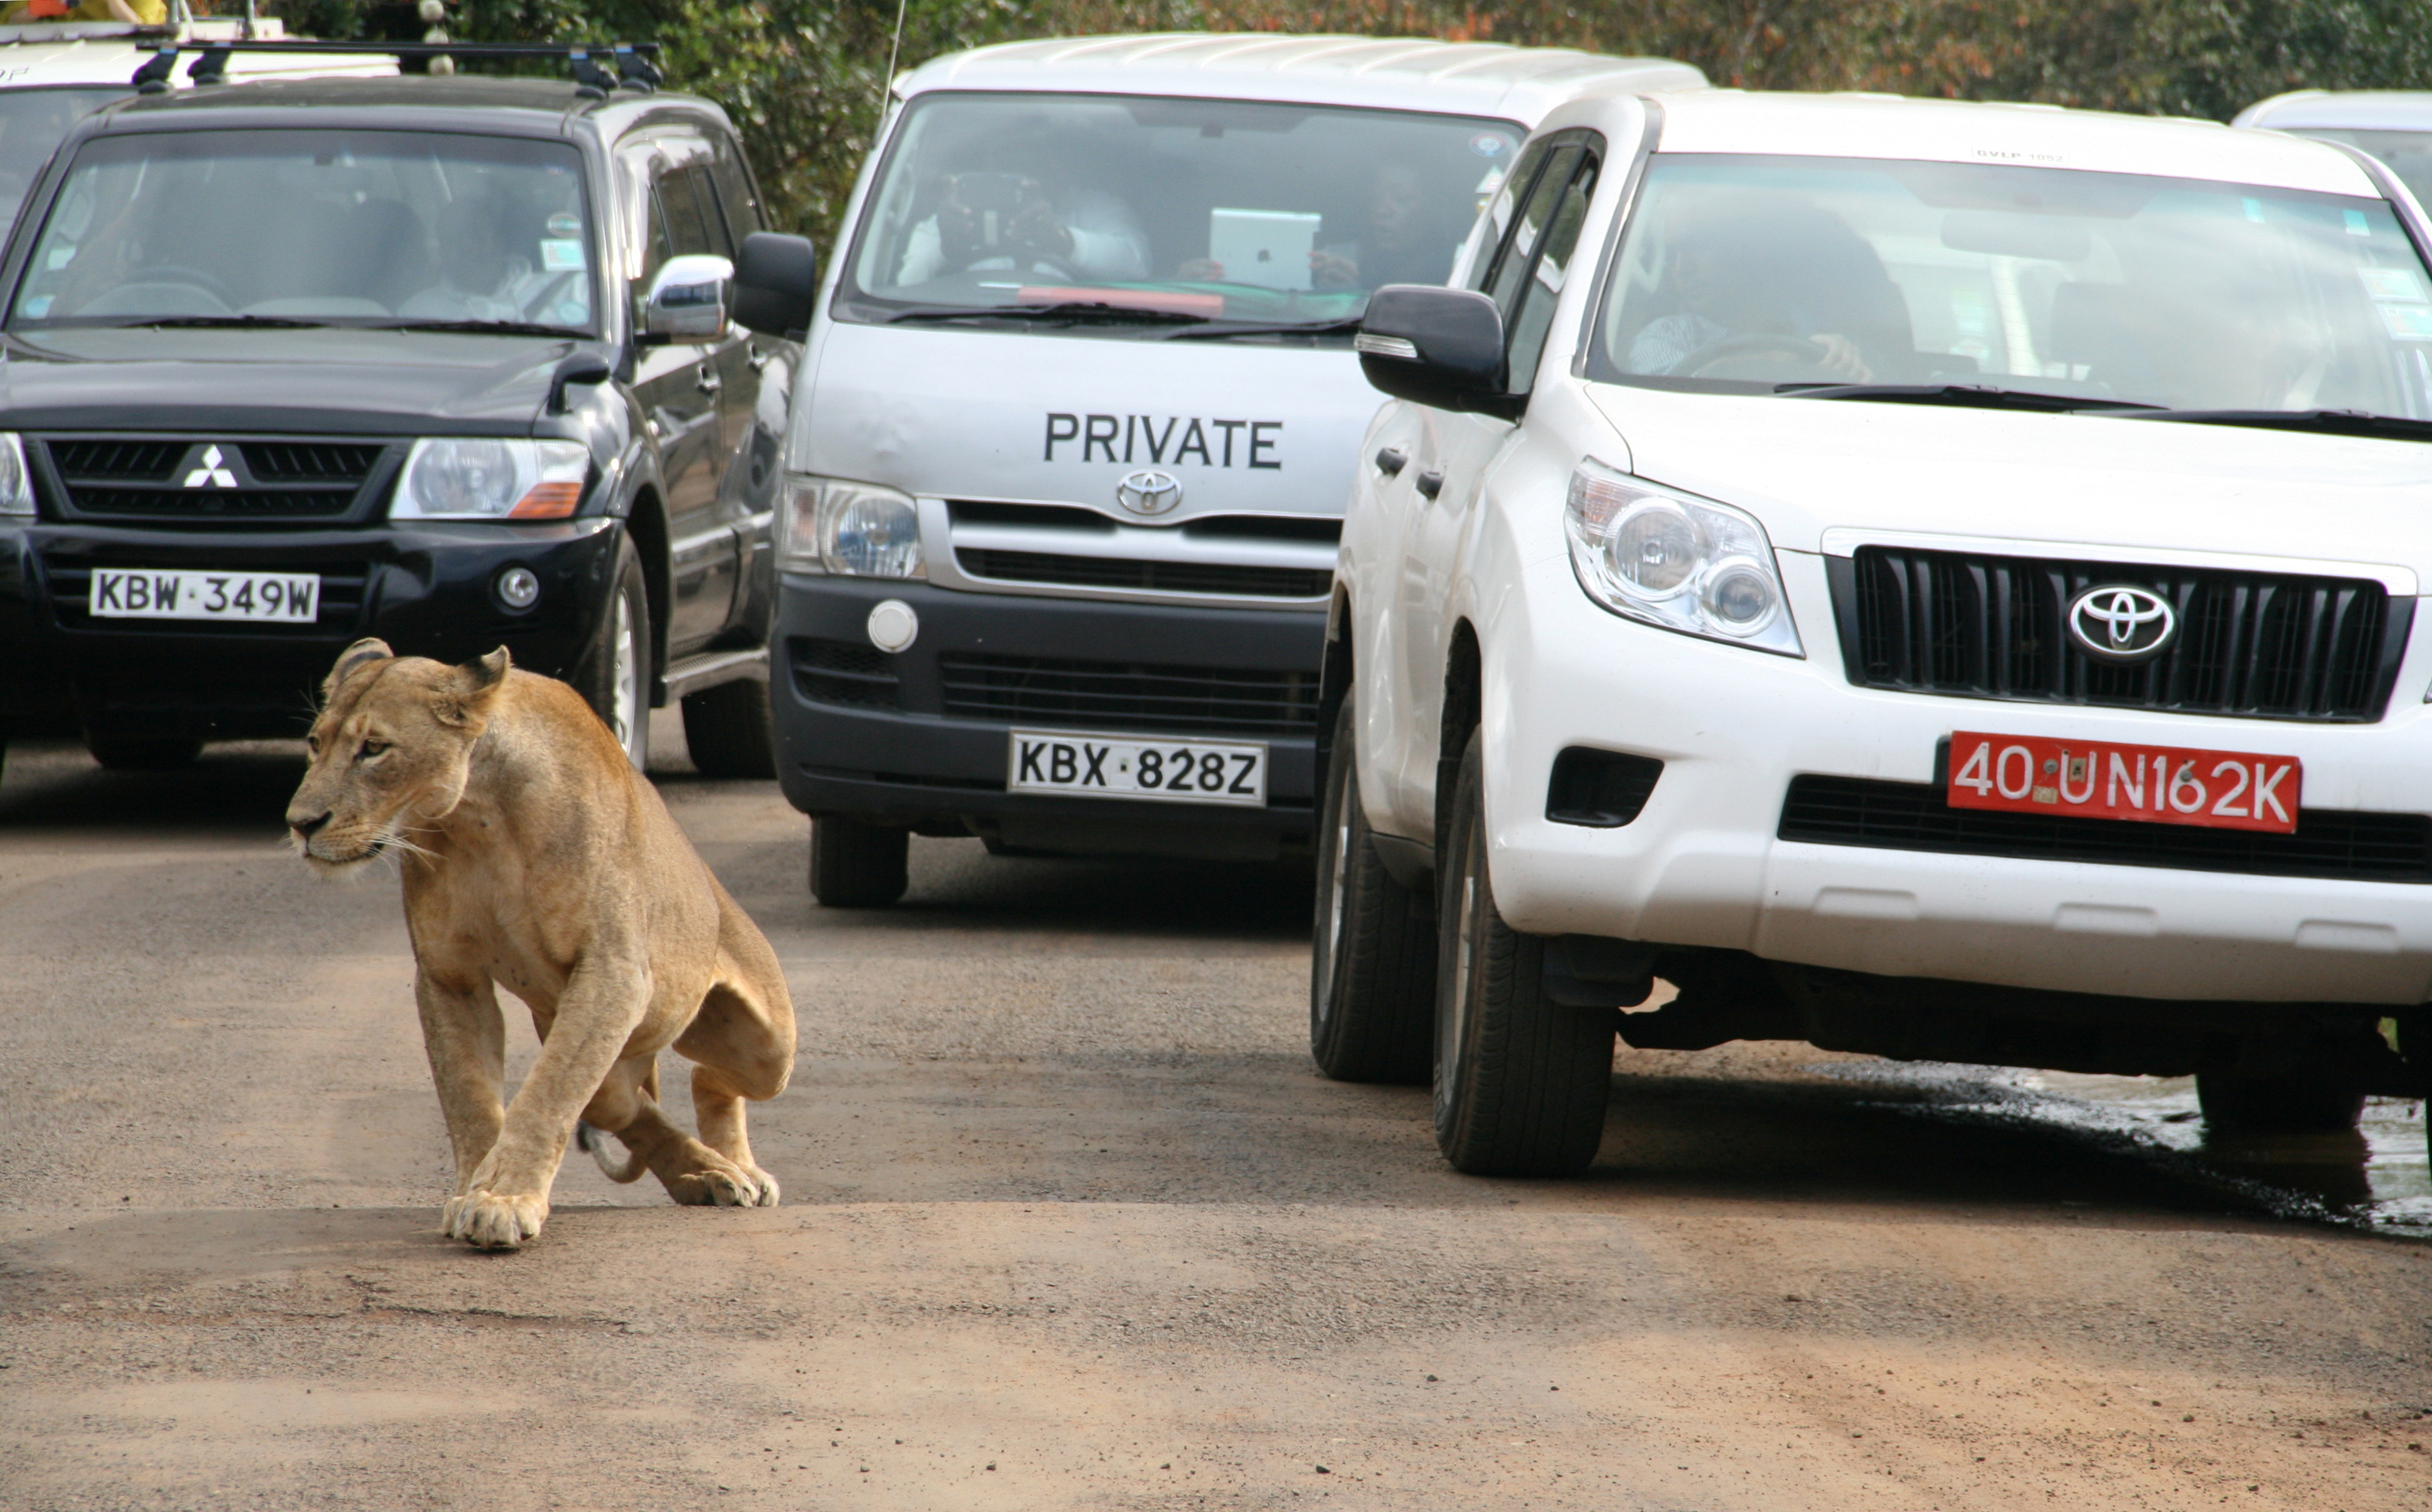 A lioness walks along a road as visitors sit in their vehicles at Nairobi's National Park in Kenya's capital Nairobi, July 12, 2014. REUTERS/Edmund Blair